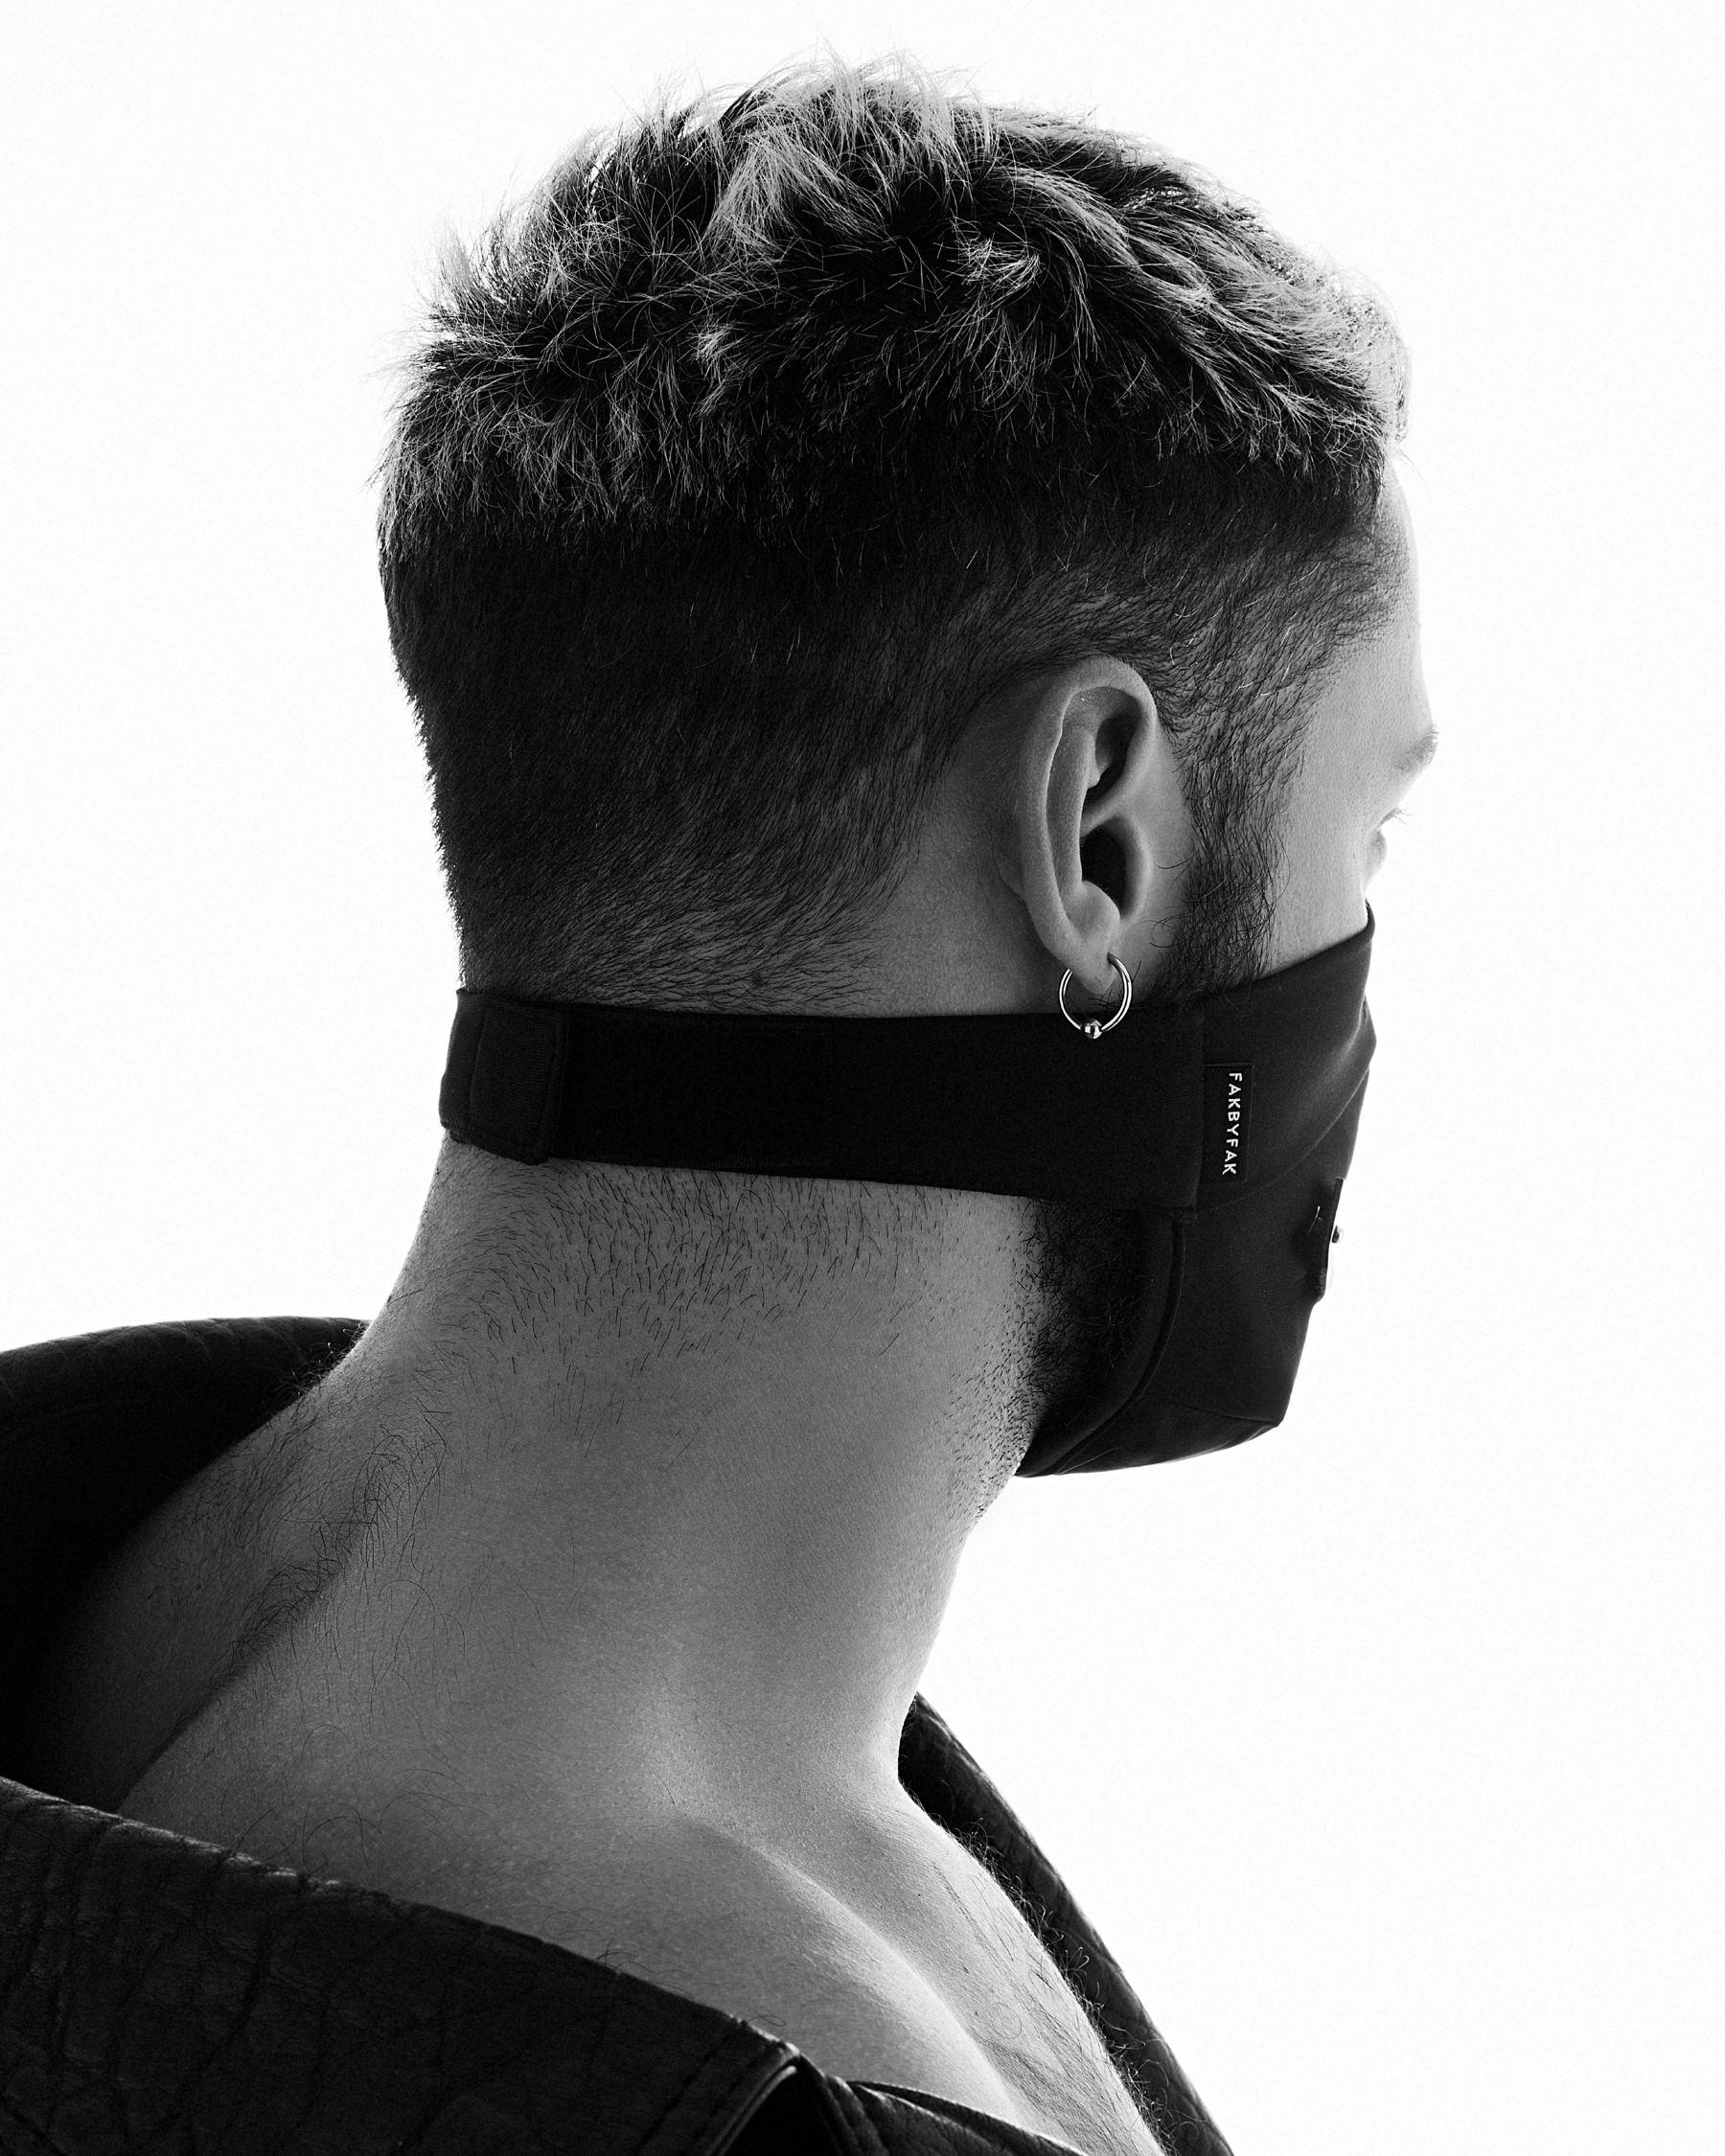 TOM OF FINLAND x FAKBYFAK  Fine Face Covering Mask. Exclusive Centennial Edition. Black Code: FBF-41103-02